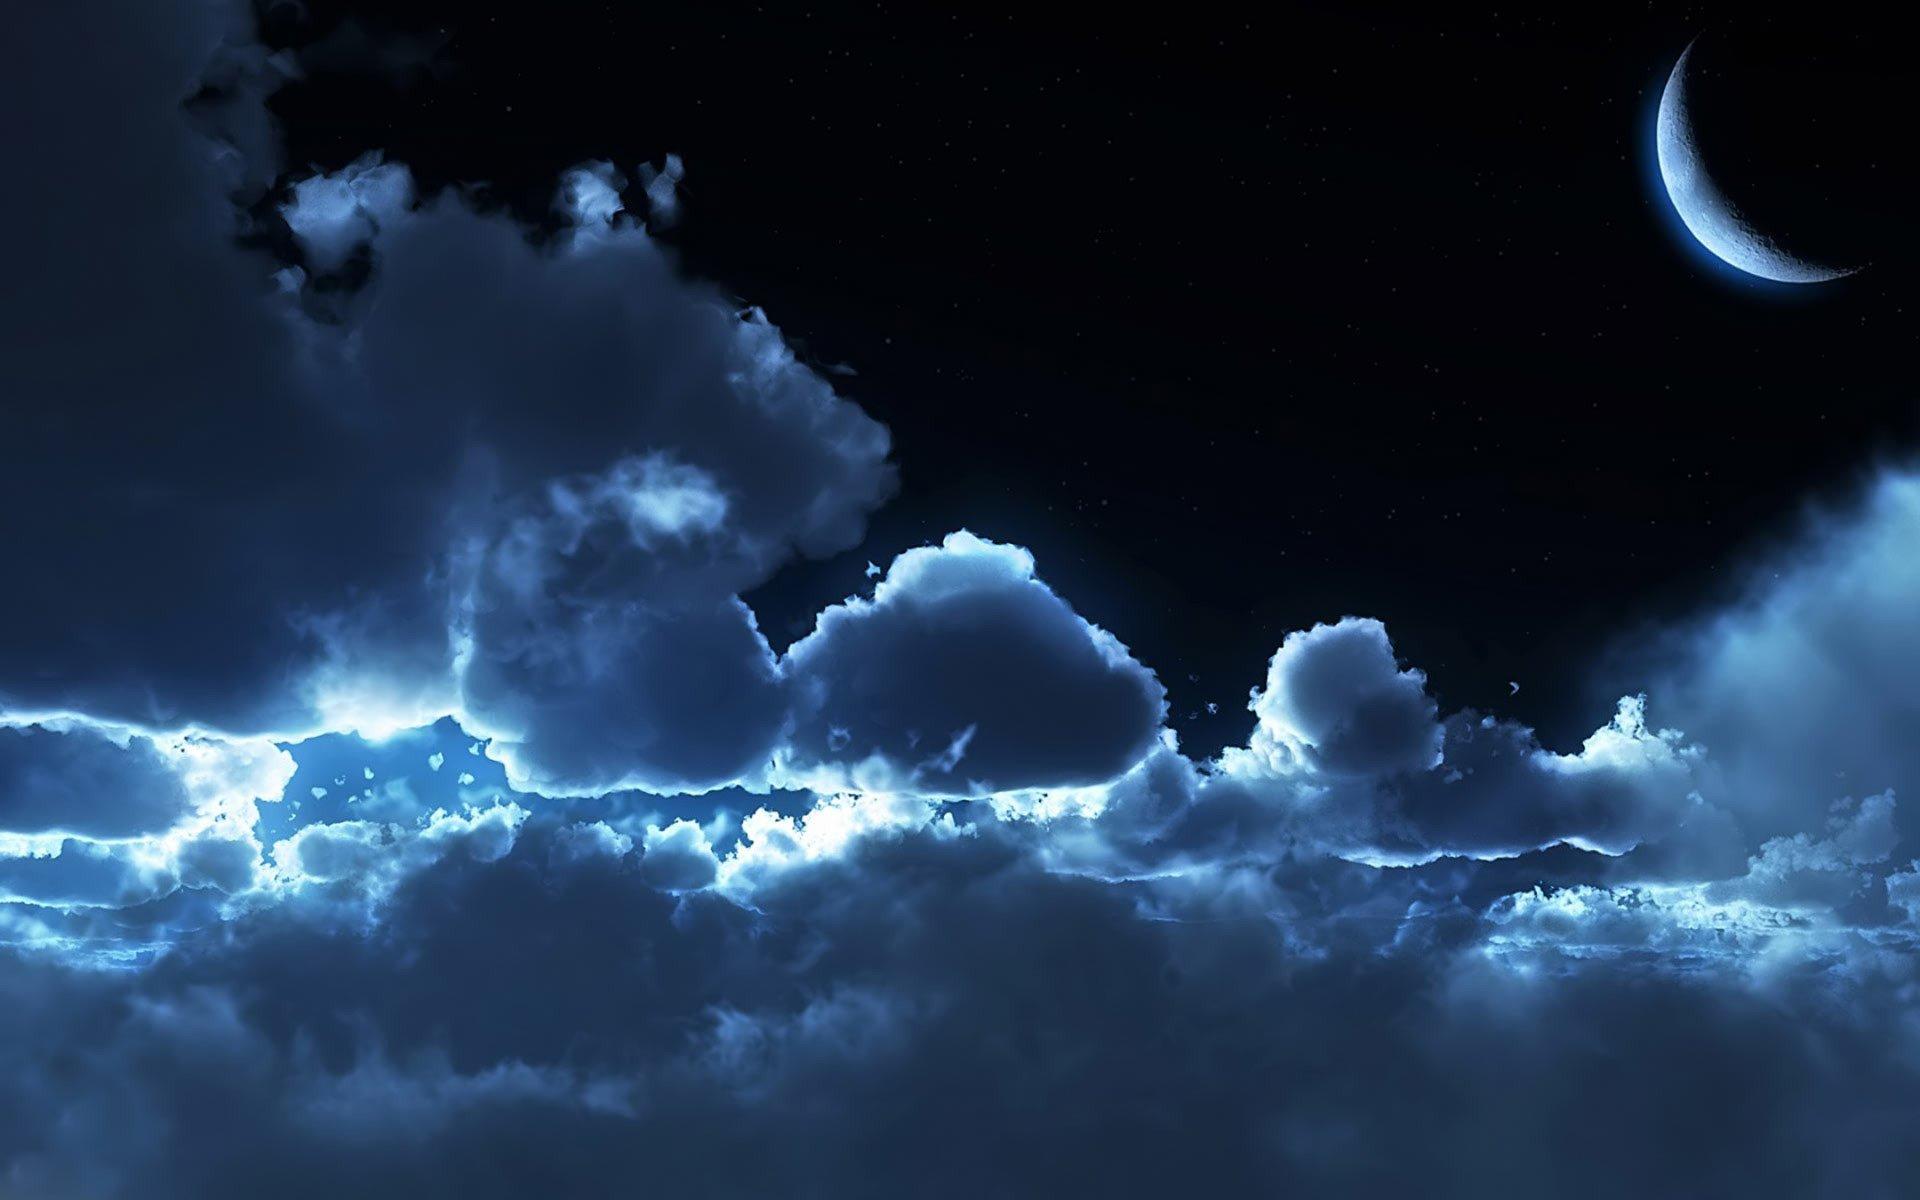 Fantasy sky cloud moon moonlight wallpaper 1920x1200 - Wallpaper picture ...